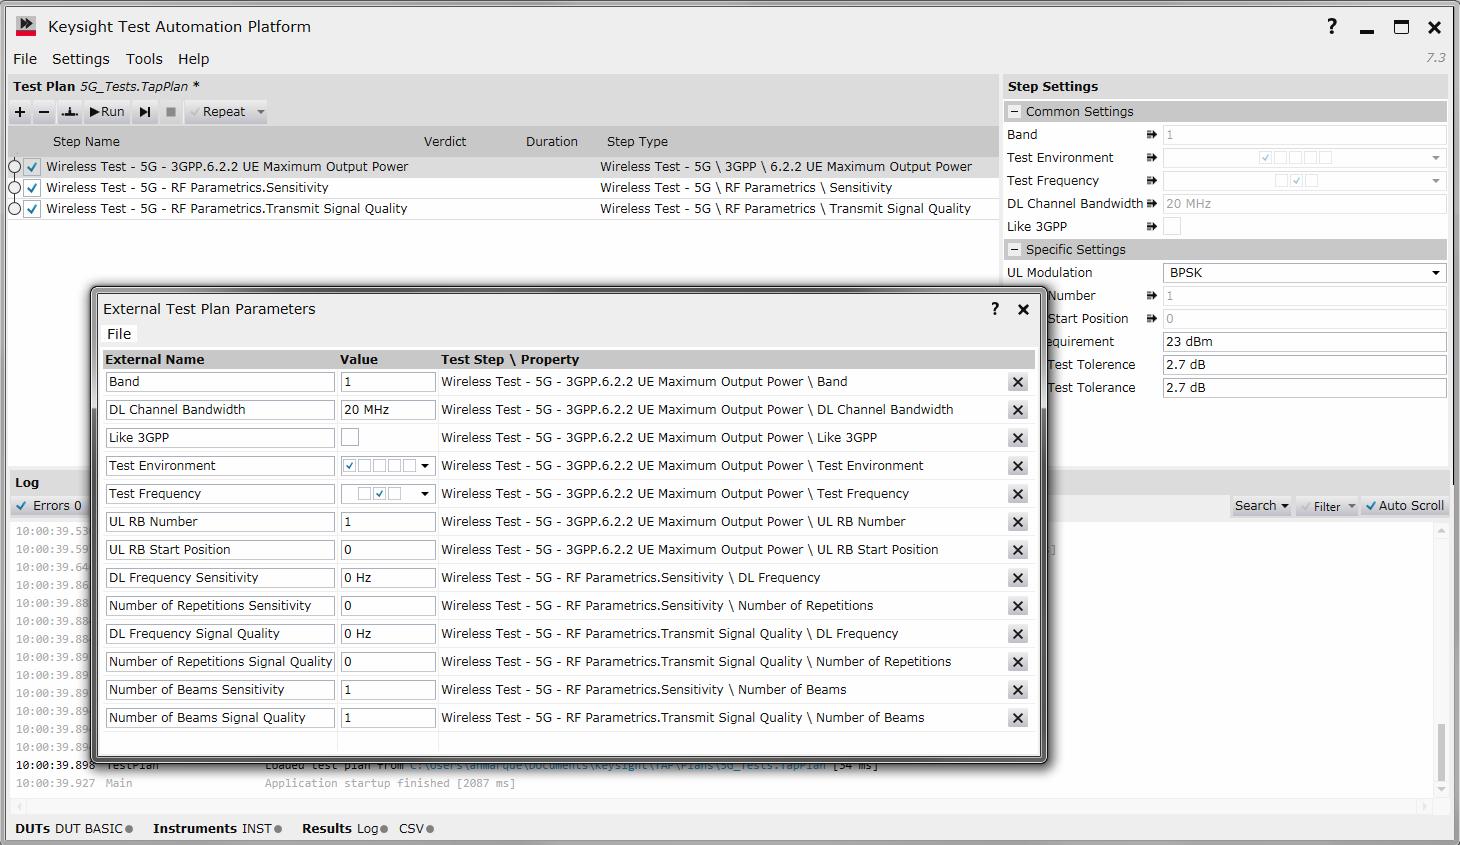 Keysight 5G Network Emulation Solutions Portfolio - Keysight News